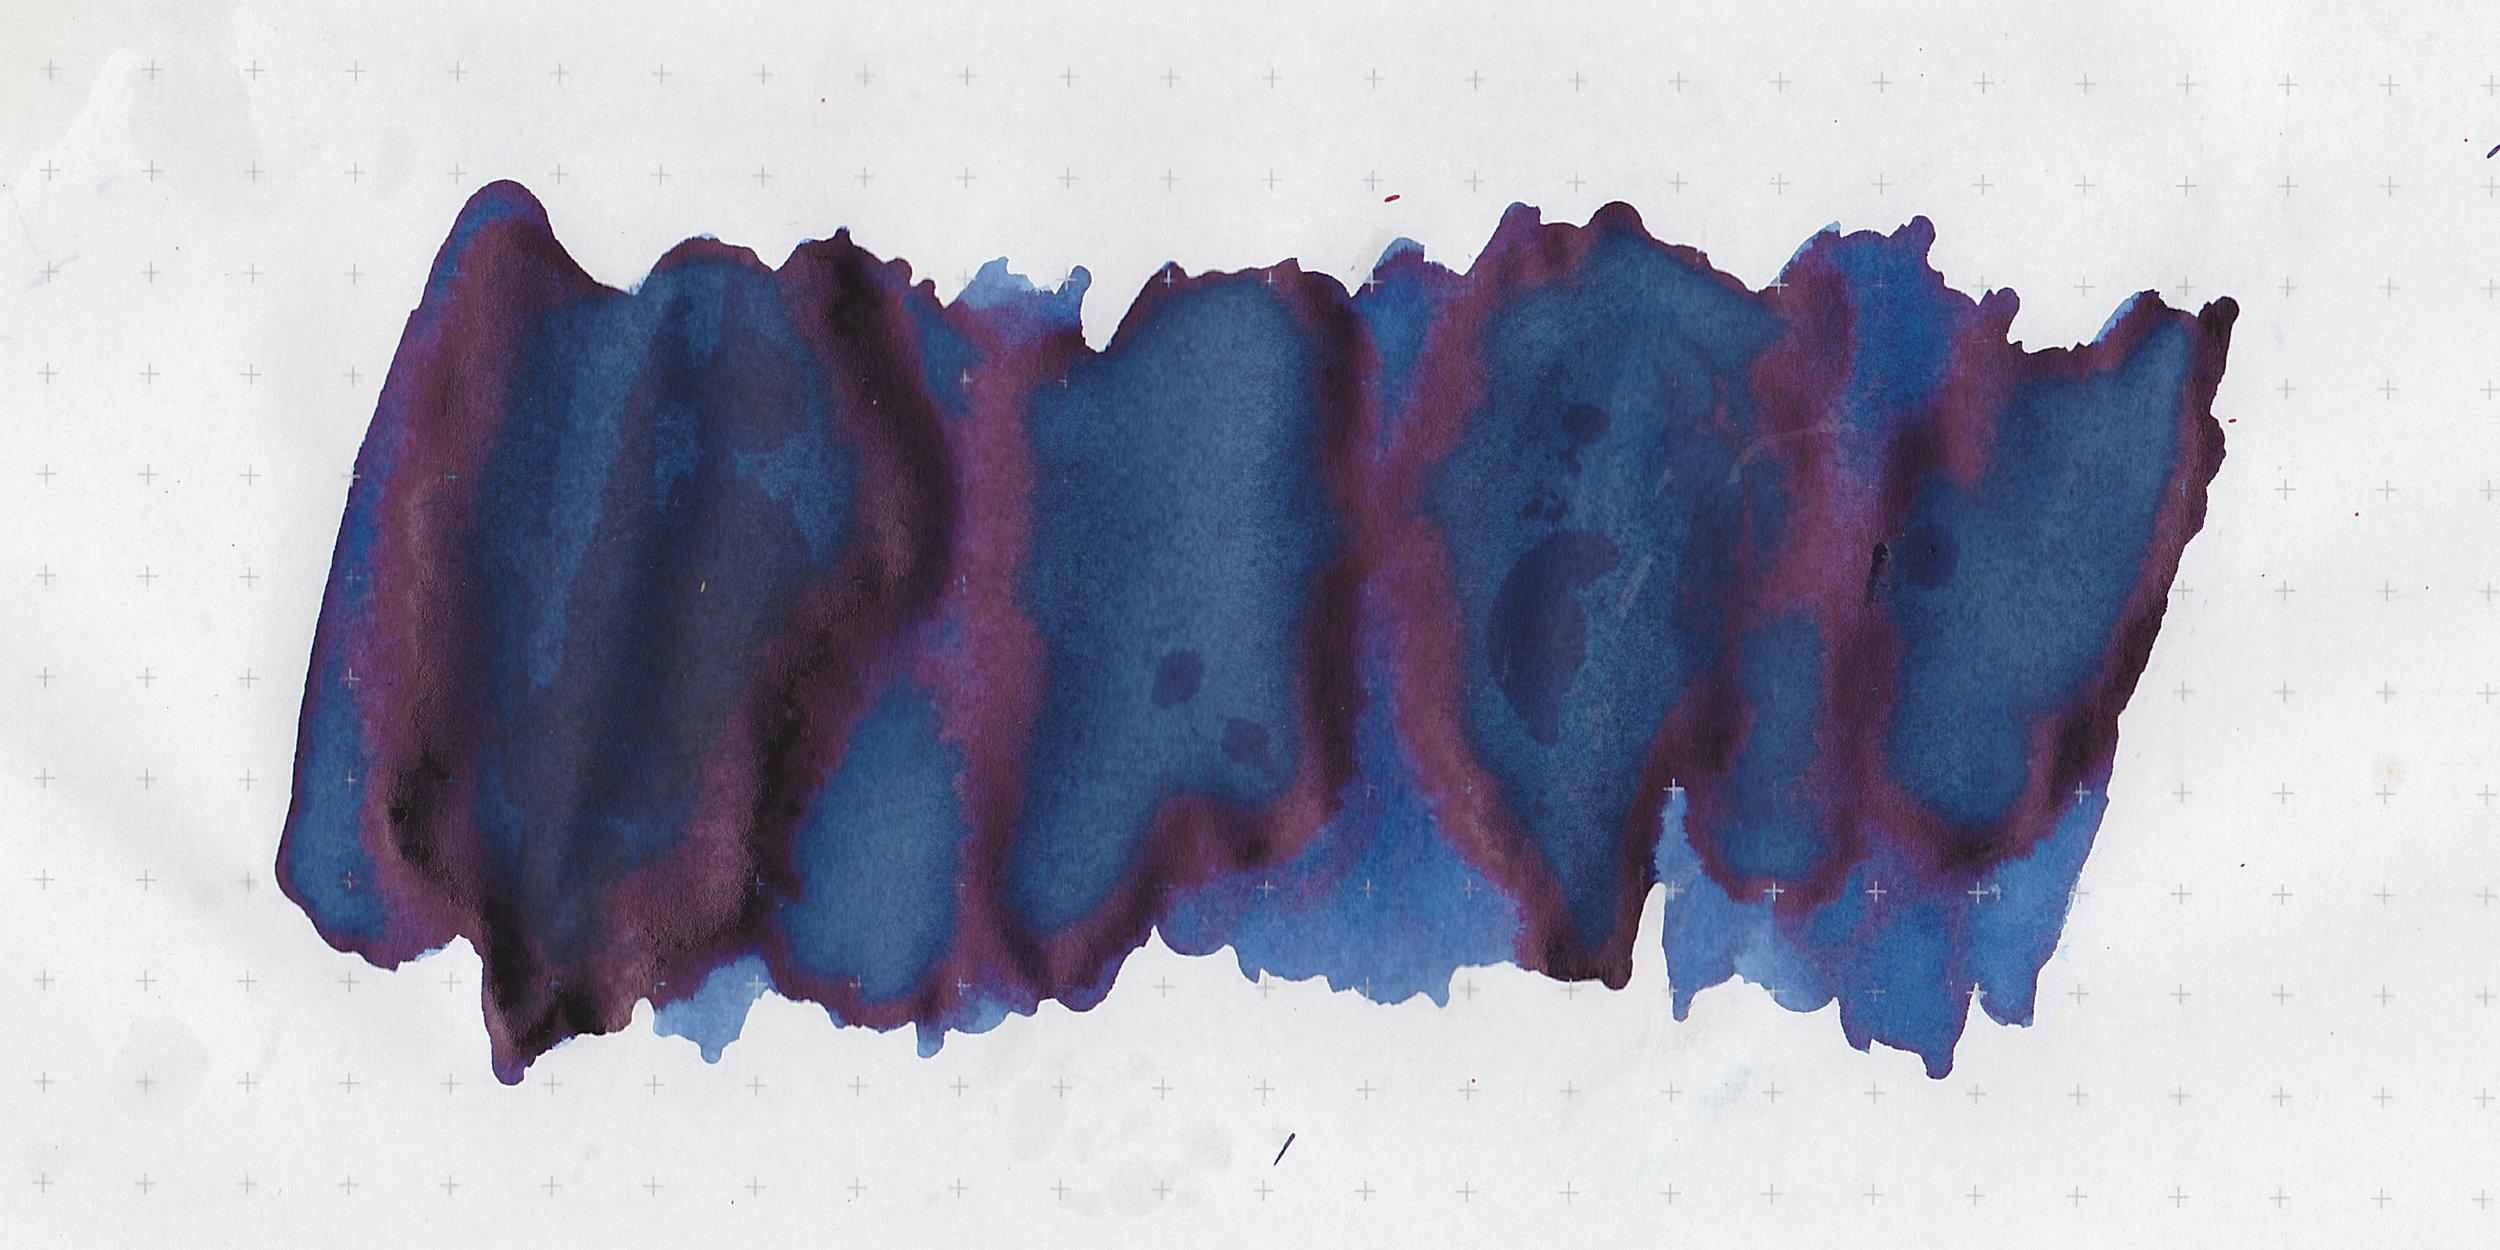 cv-saturn-v-15.jpg